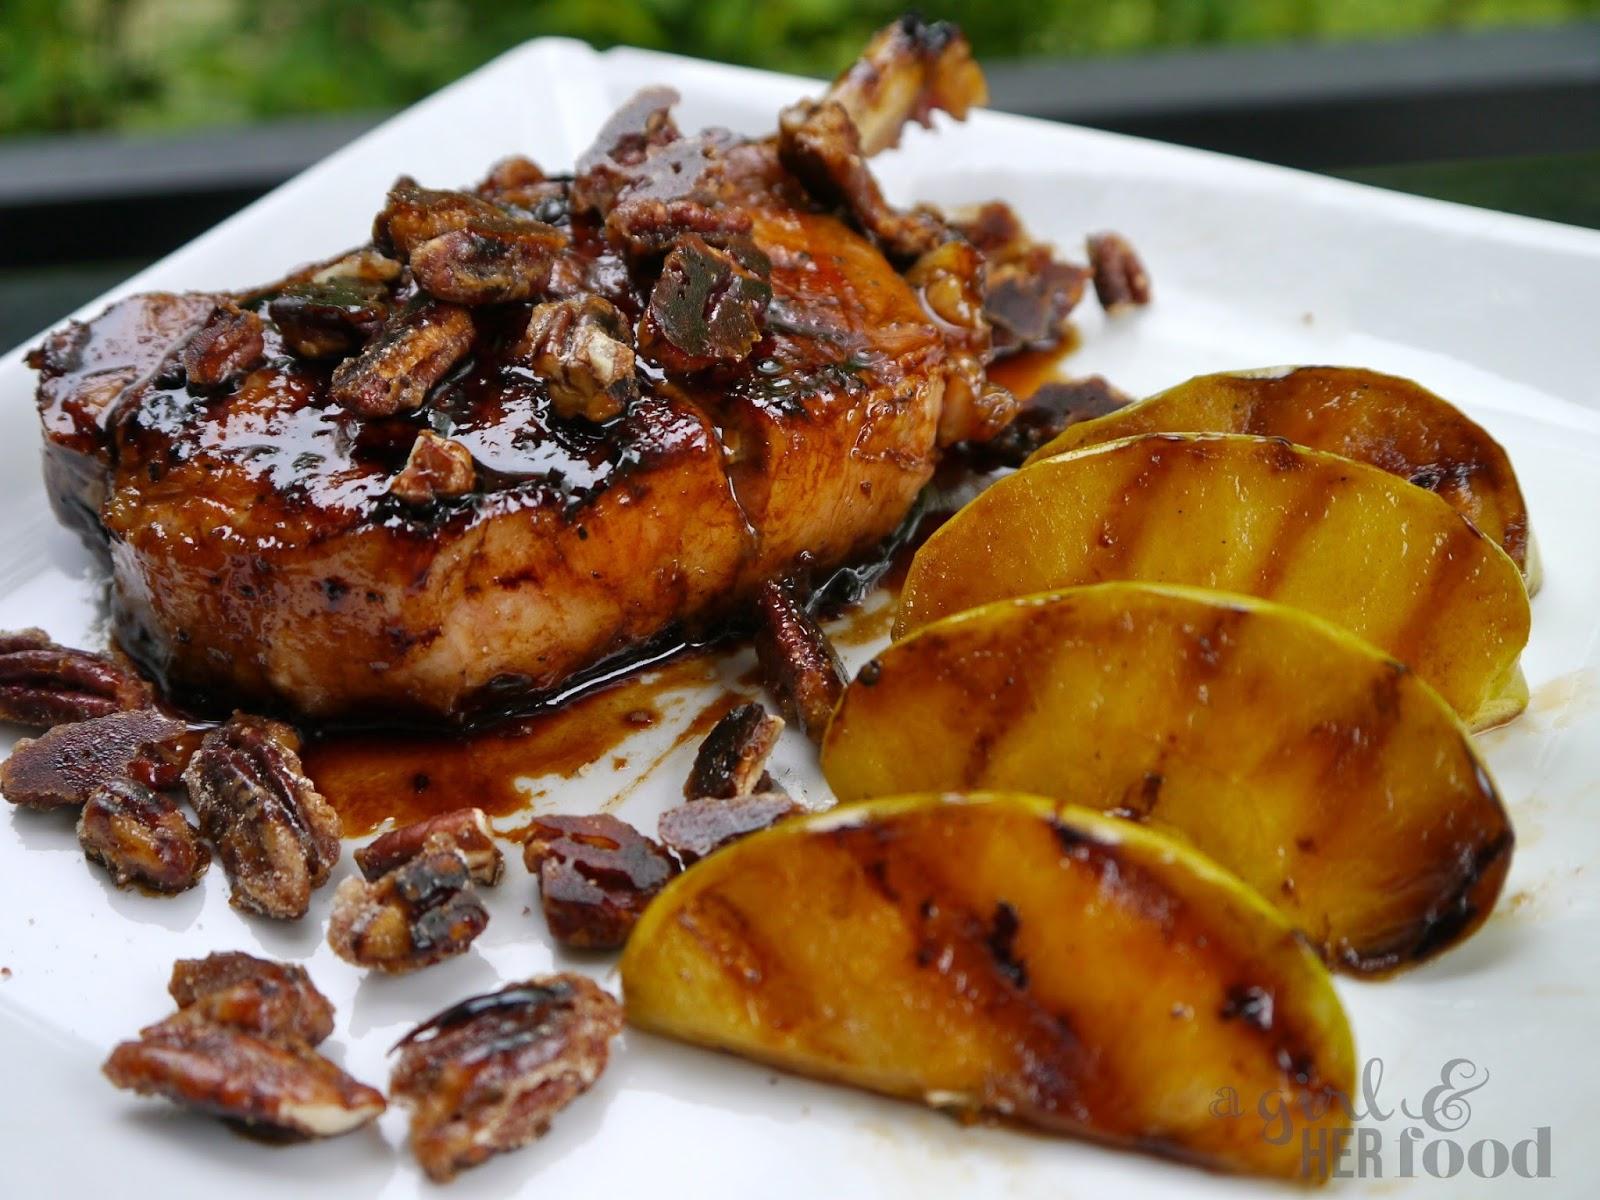 Girl & Her Food: Maple Glazed Pork Chops, Pecans & Green Apples